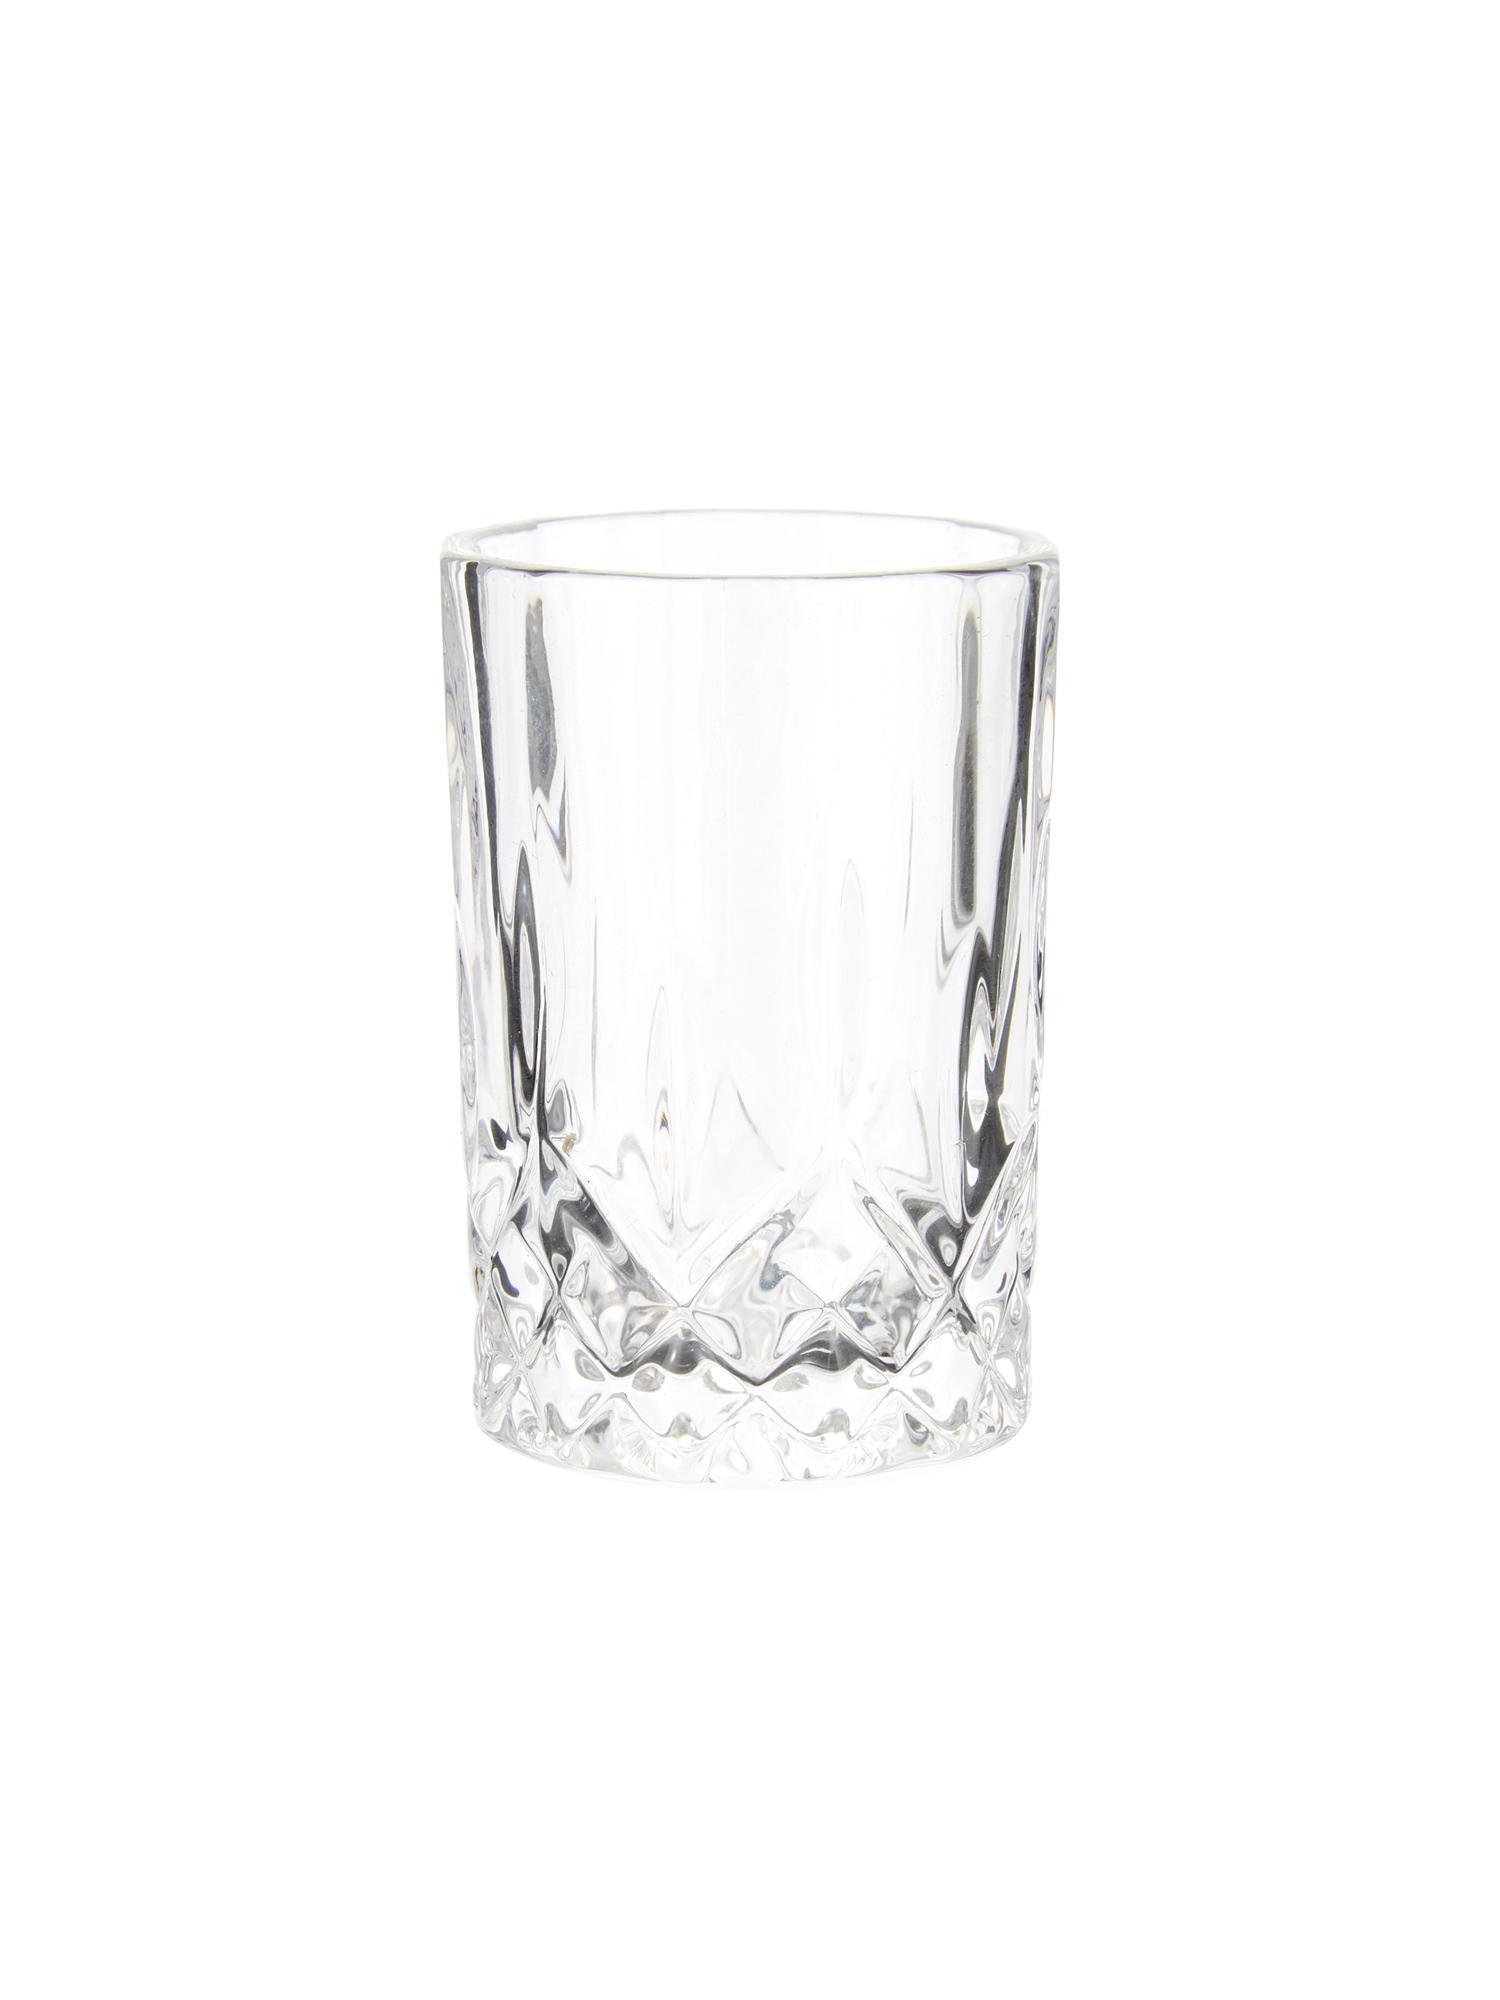 Vasos chupito Harvey, 4uds., Vidrio, Transparente, Ø 6 x Al 8 cm